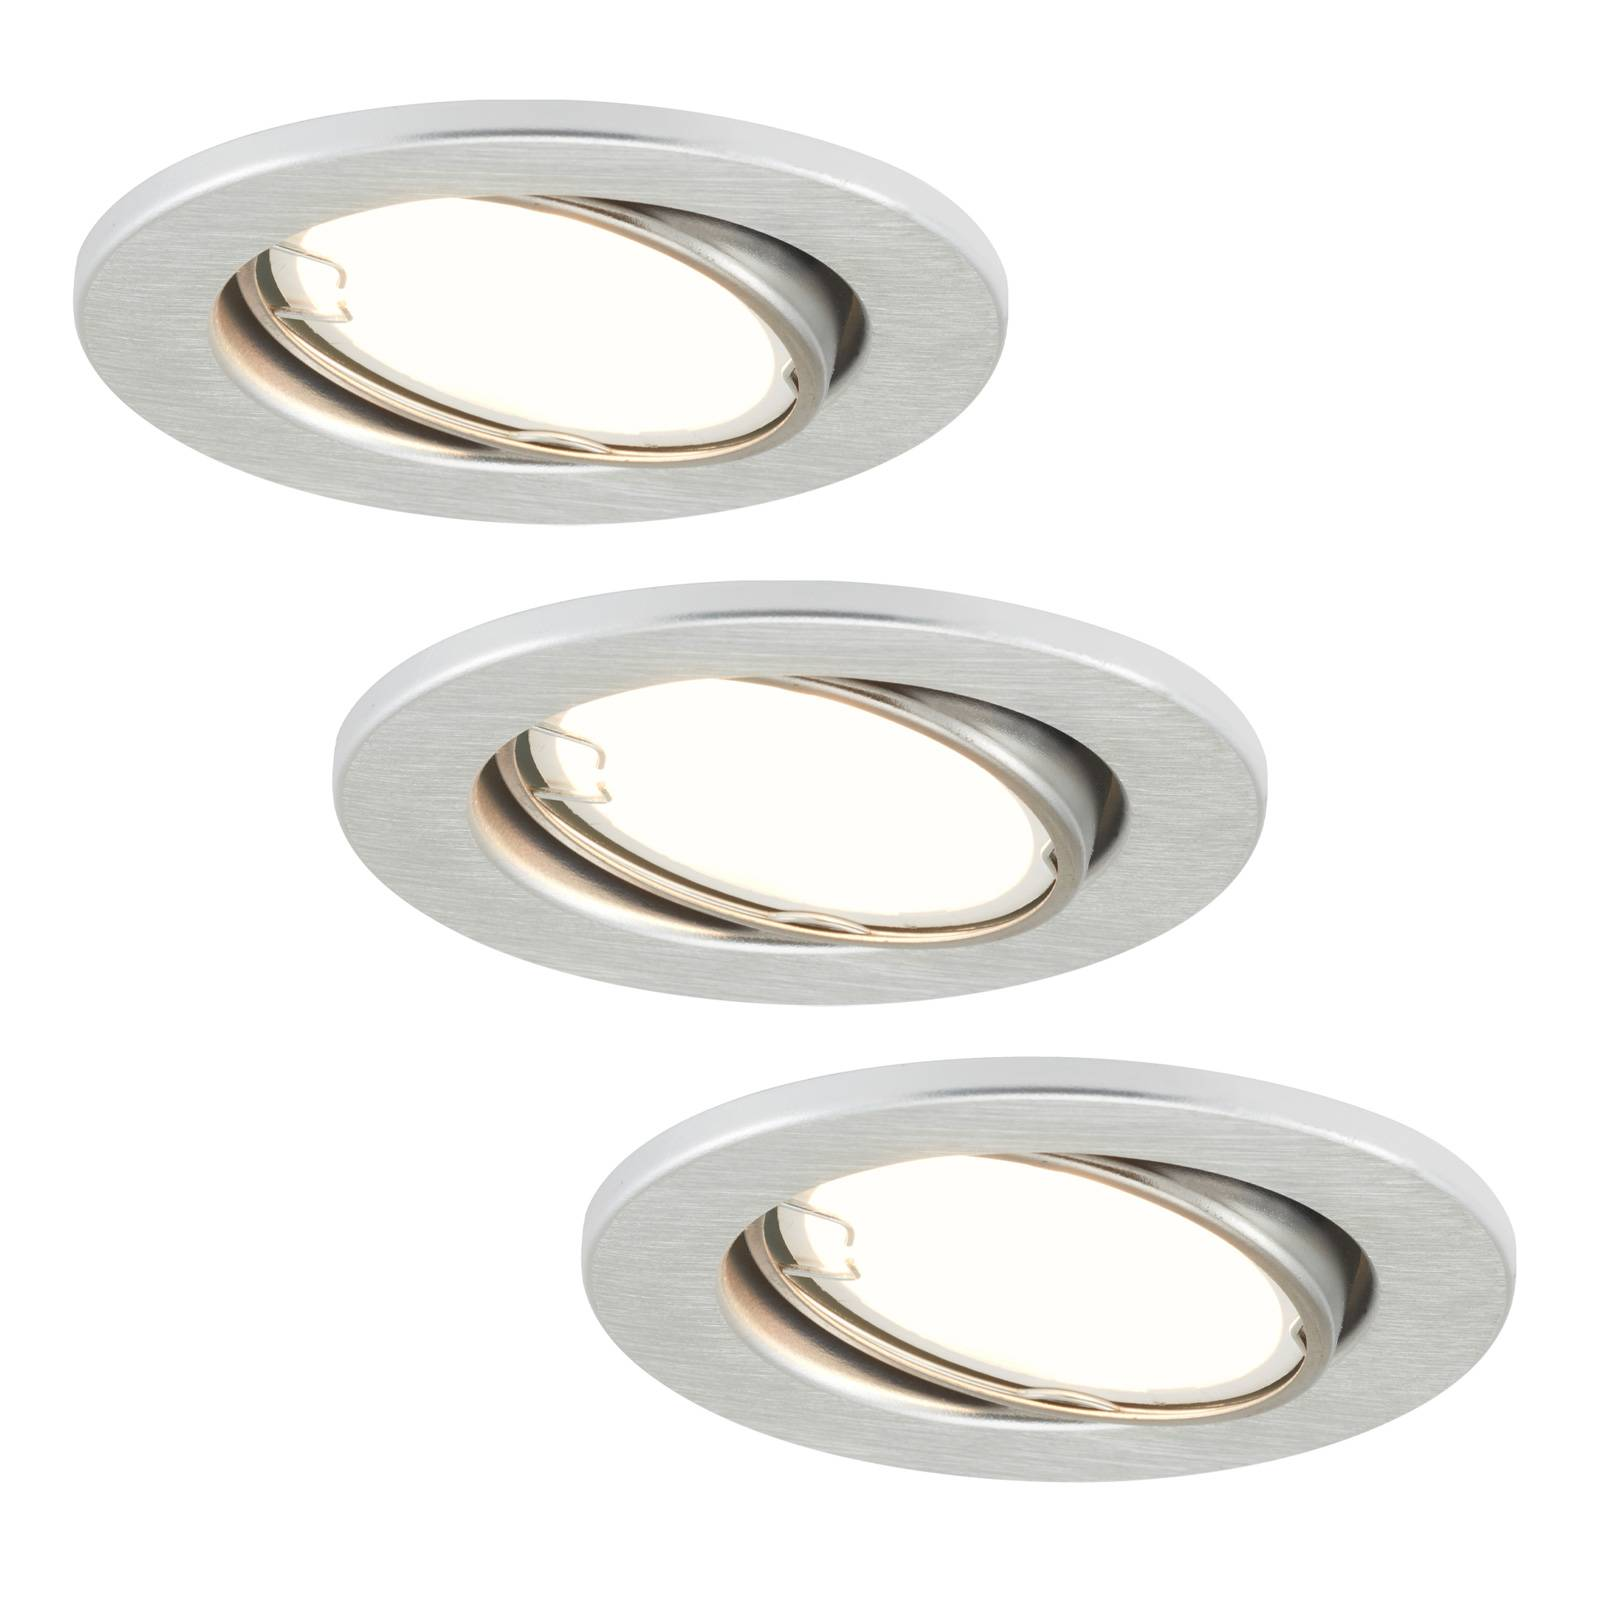 LED-uppovalaisimet 7221-039 Fit 3 kpl, nikkeli